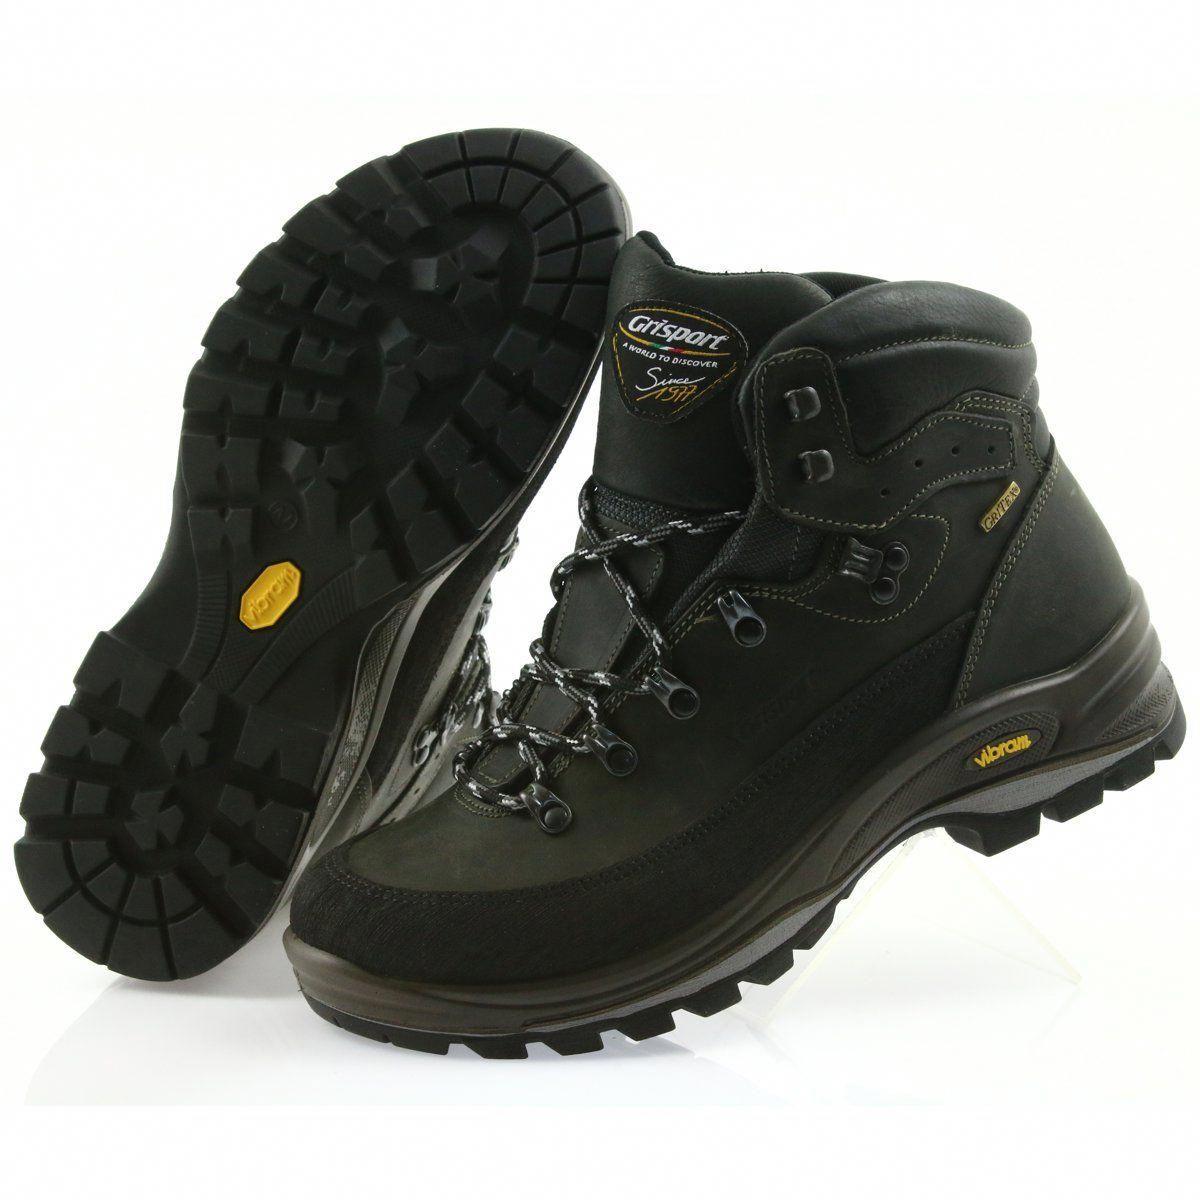 Trekkingowe Meskie Grisport Grisport Czarne Buty Trekkingowe Trailshoes Trekking Shoes Boots Shoes